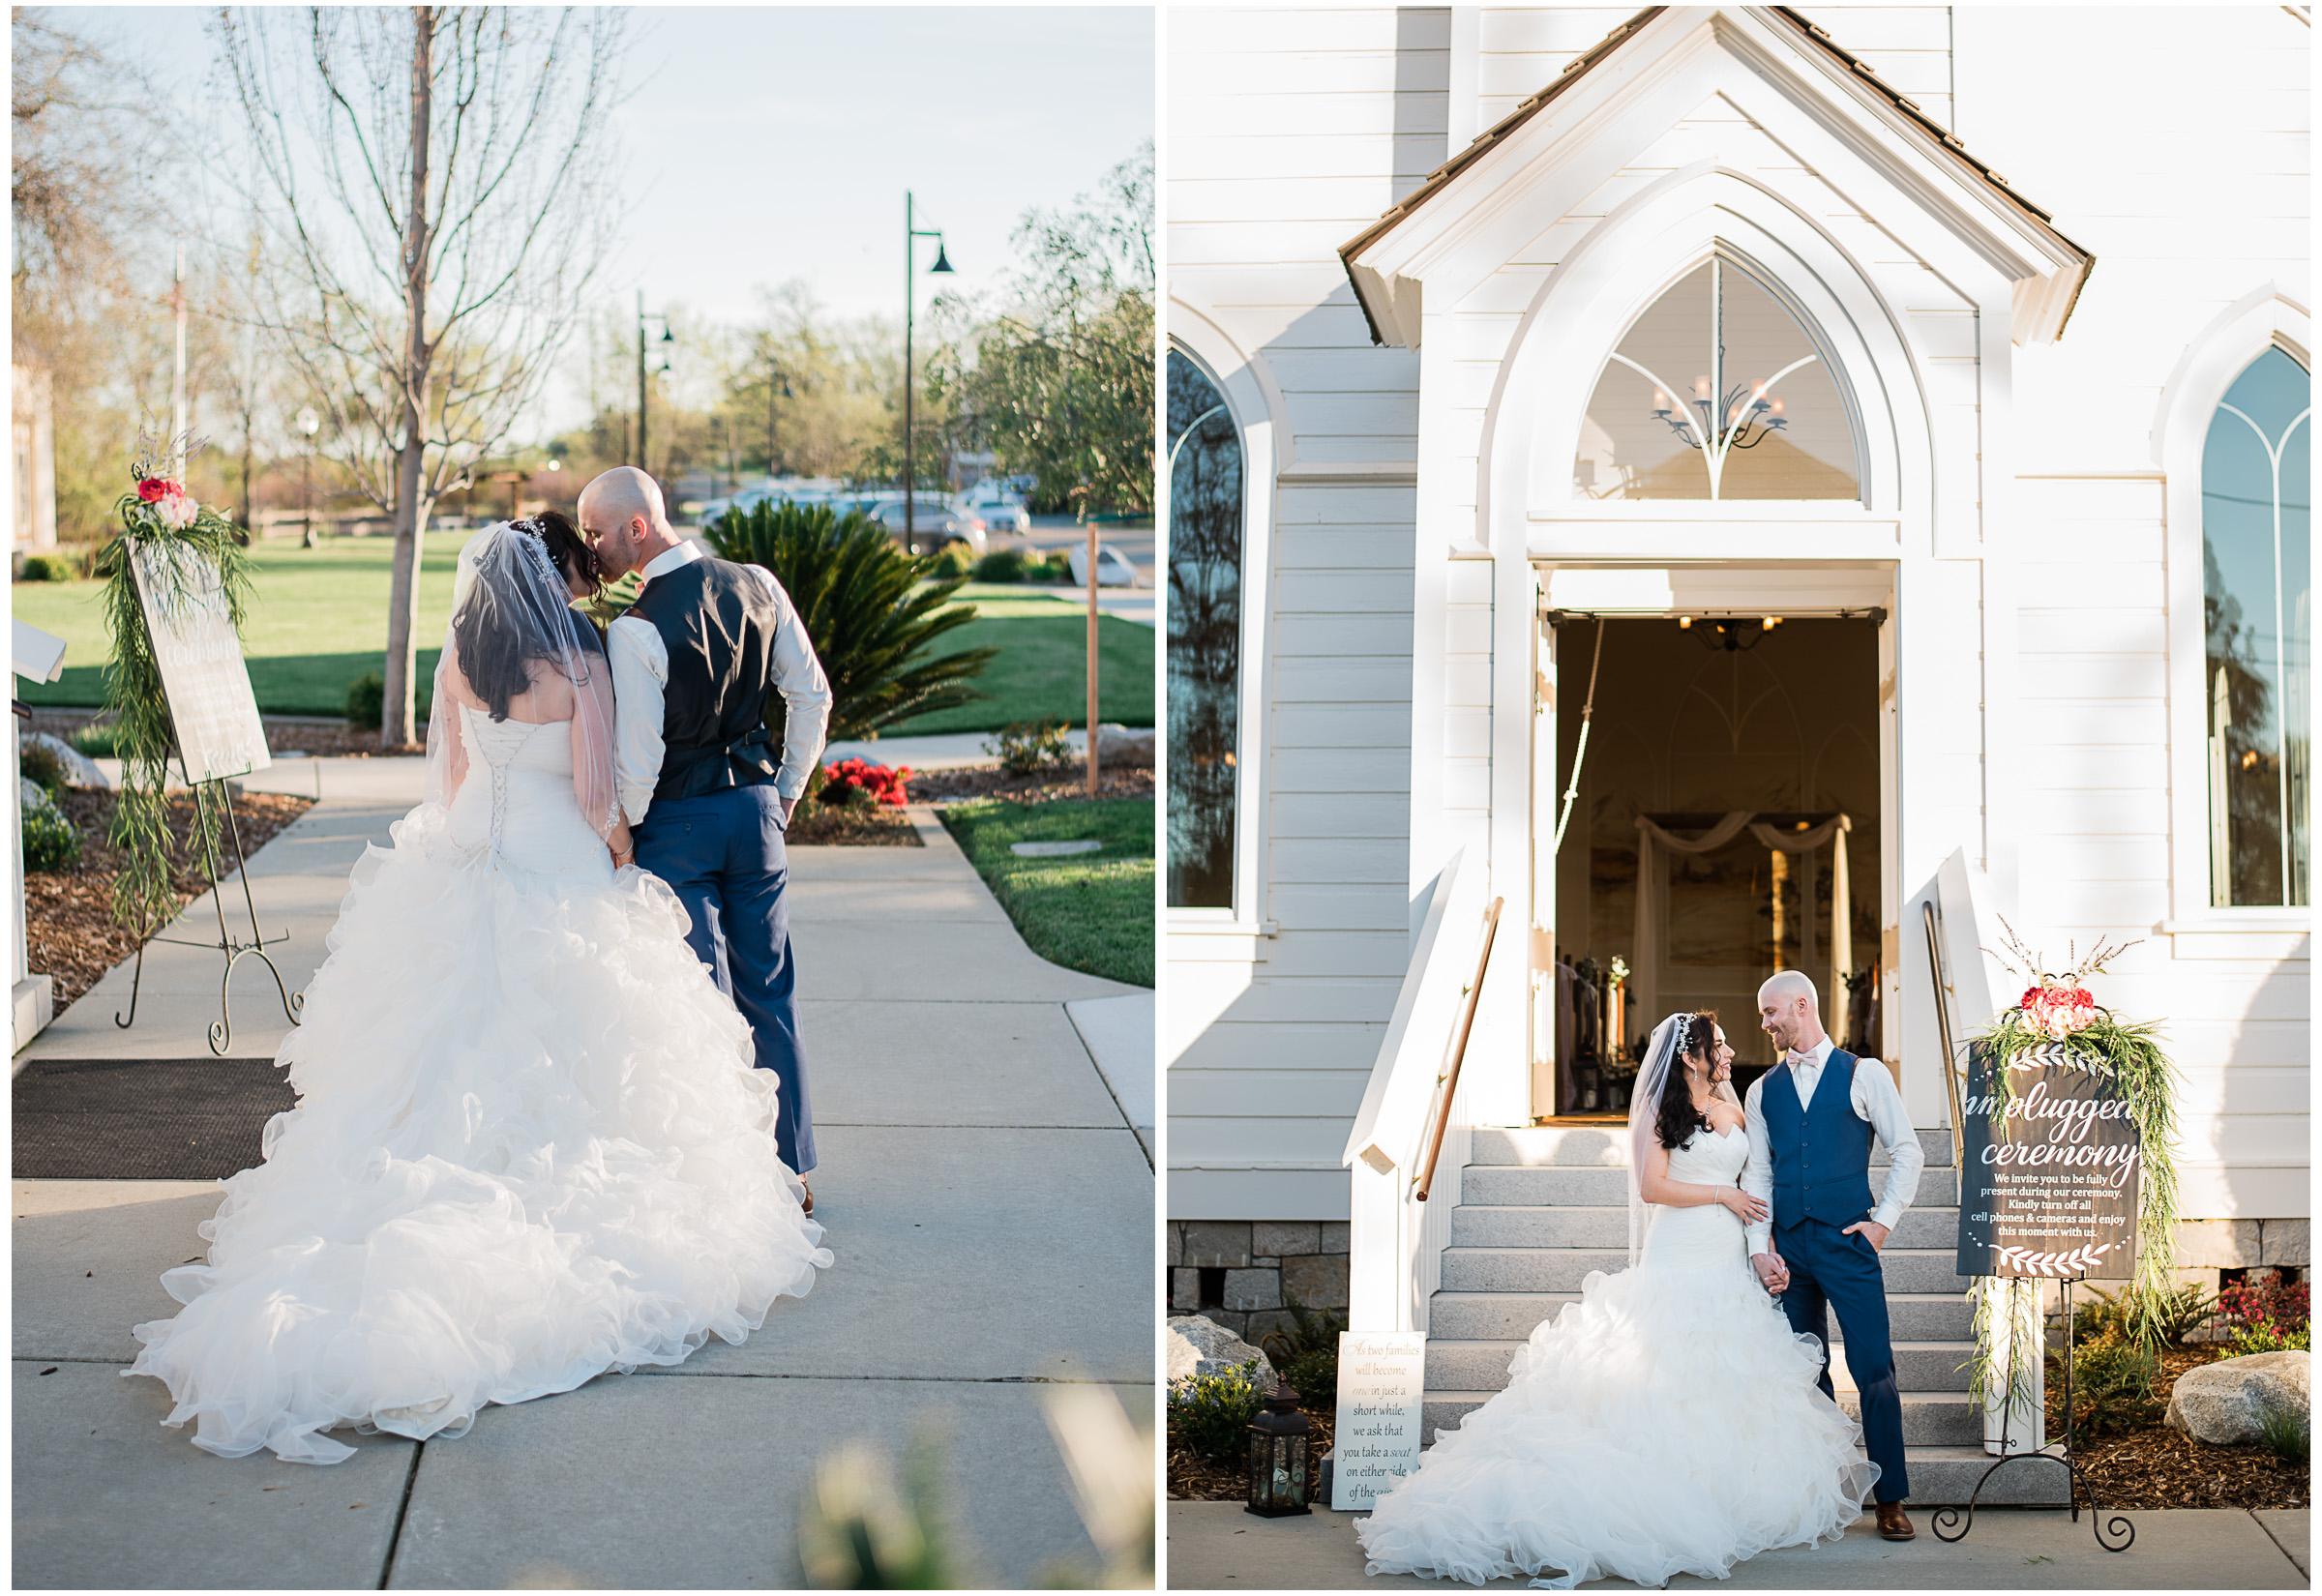 Sacramento Wedding - Sacramento Photographer - Justin Wilcox Photography - 19.jpg